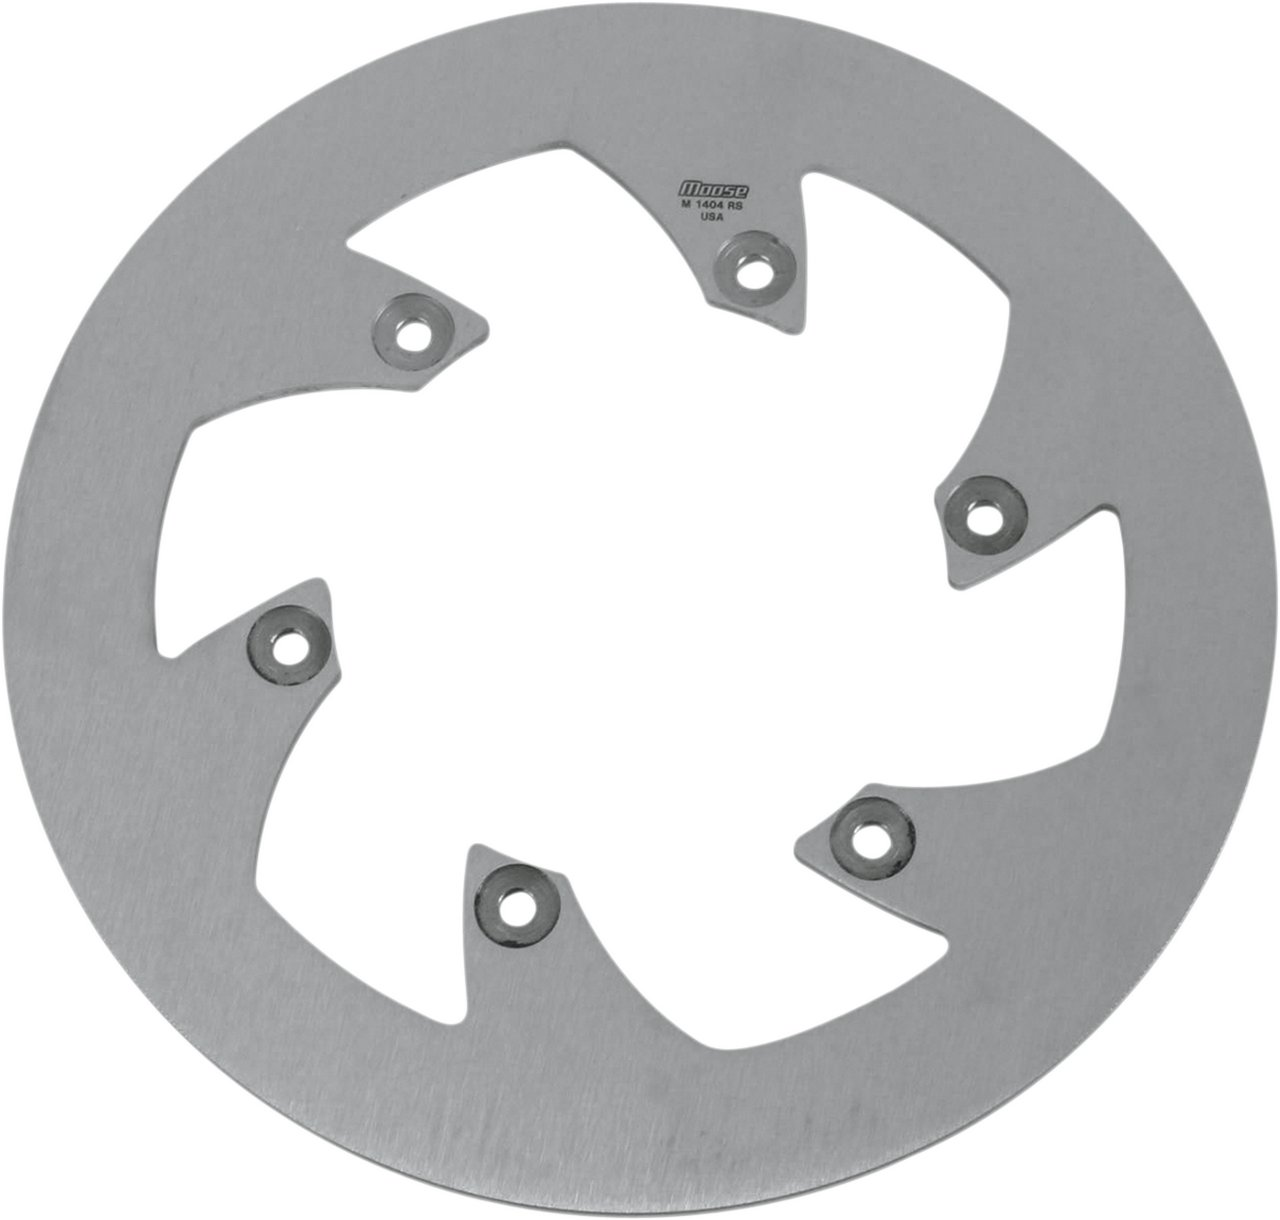 【MOOSE RACING】MUD-PROOF 實心後煞車碟盤 [M051-1404] - 「Webike-摩托百貨」